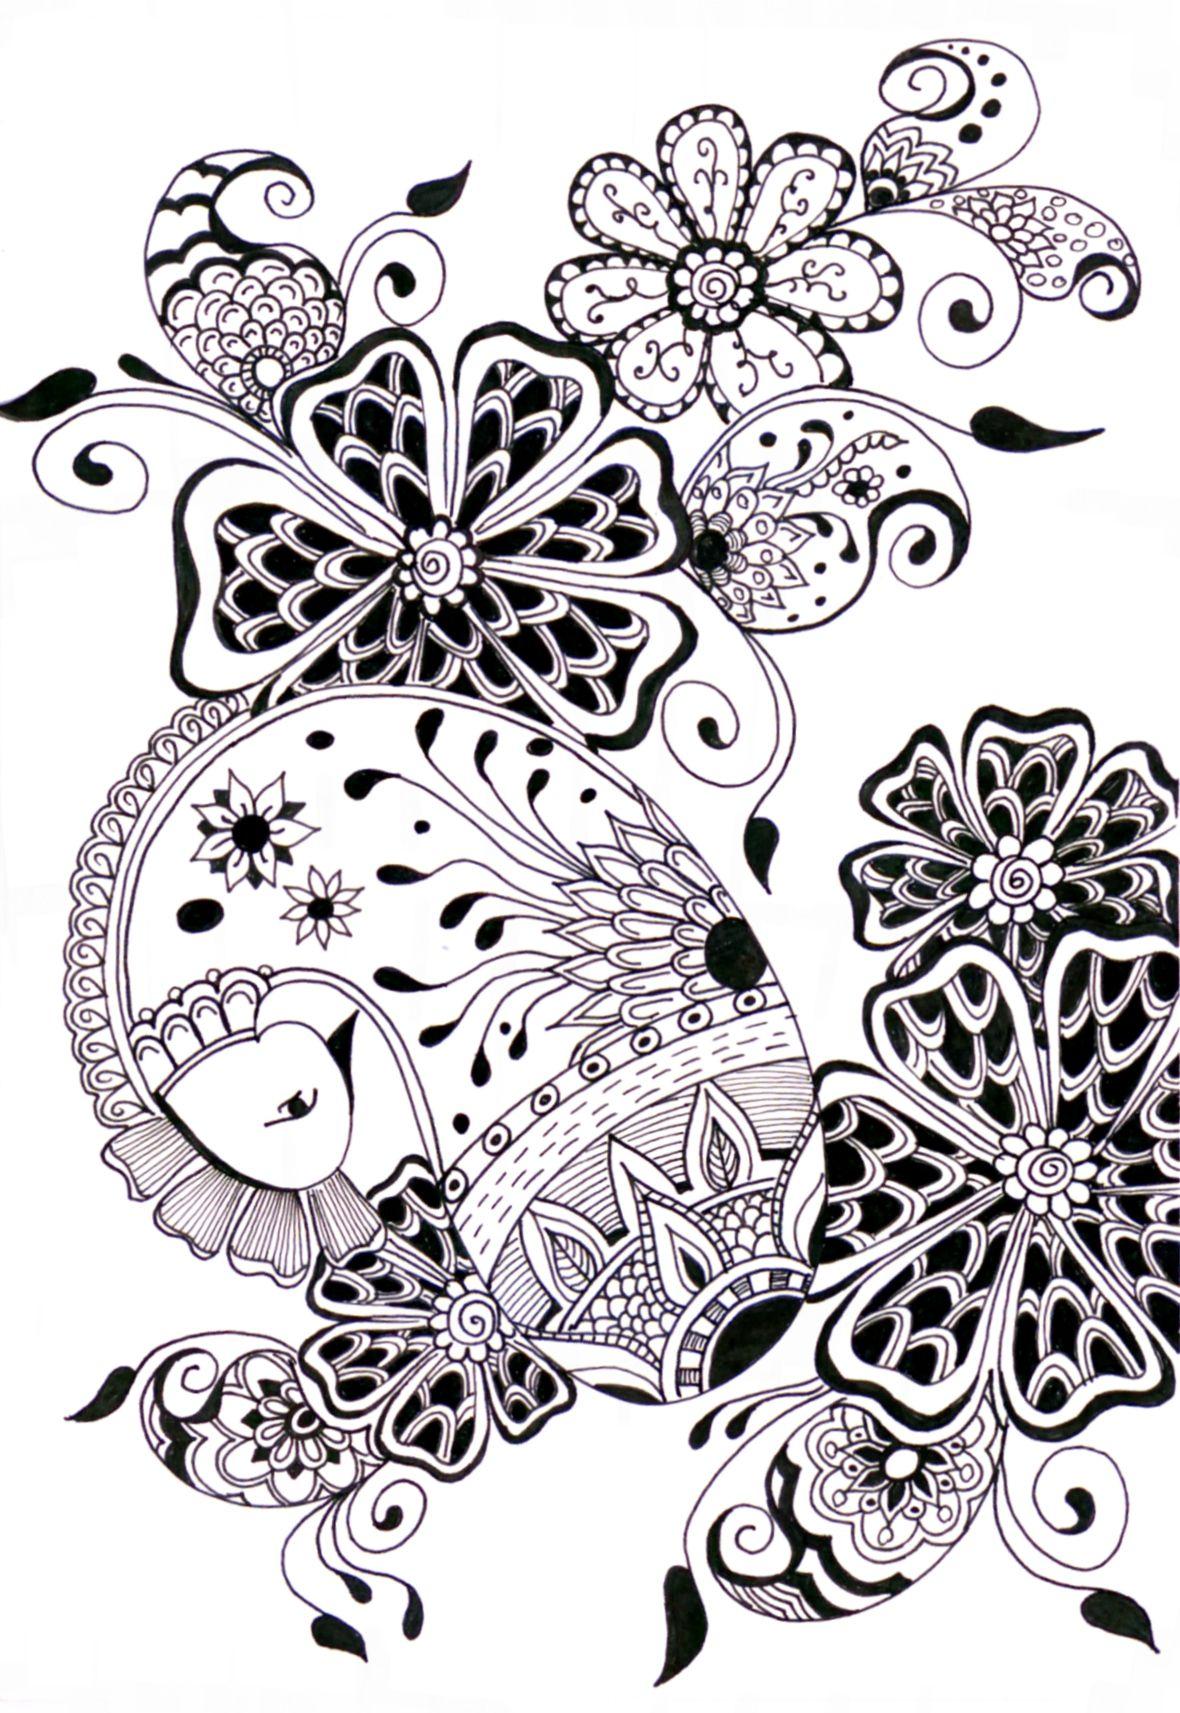 zentangle   Doodle   Pinterest   Mandalas, Dibujo y Colorear